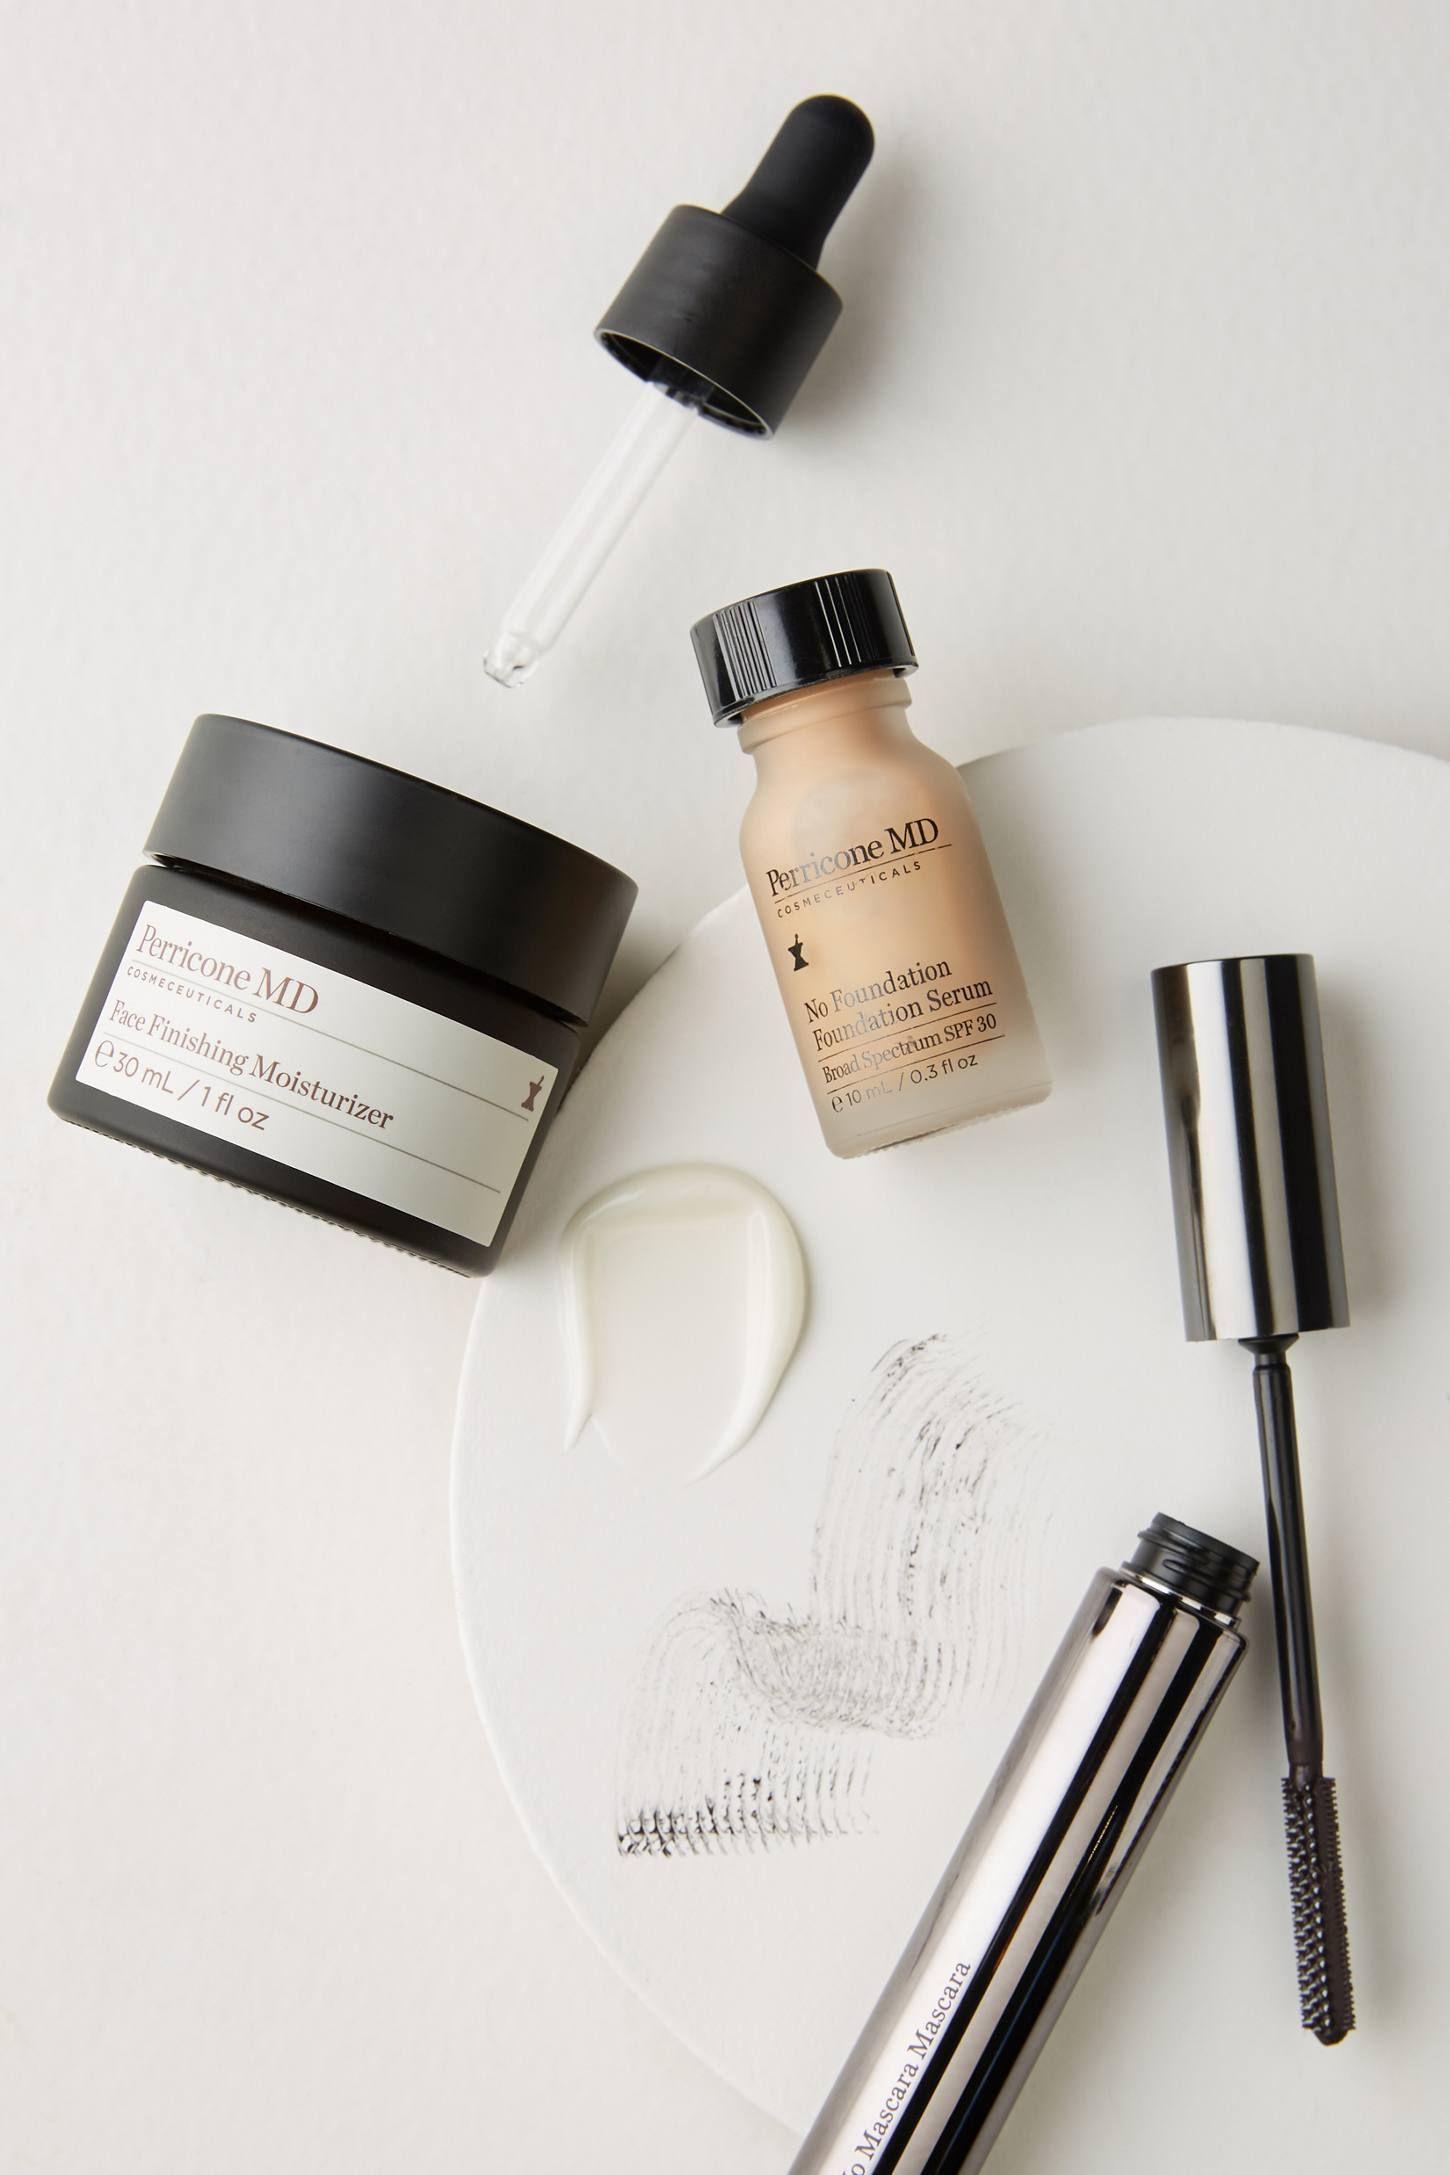 Perricone MD No Makeup Essentials Kit